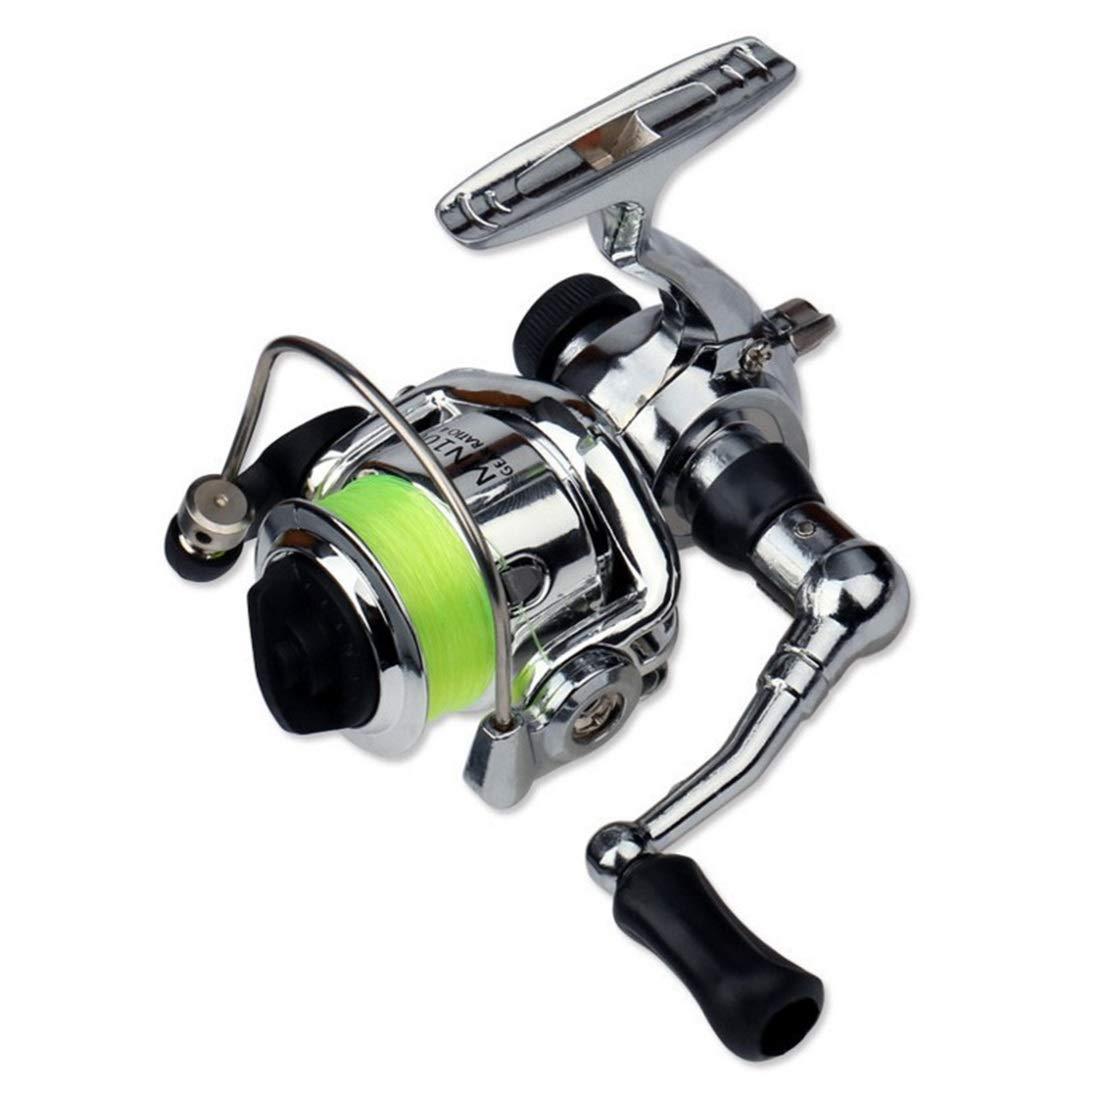 Green XIAMEND Mini Metal Body Spinning Wheel for Fish Reel Fishing Line Shake (color   Green)